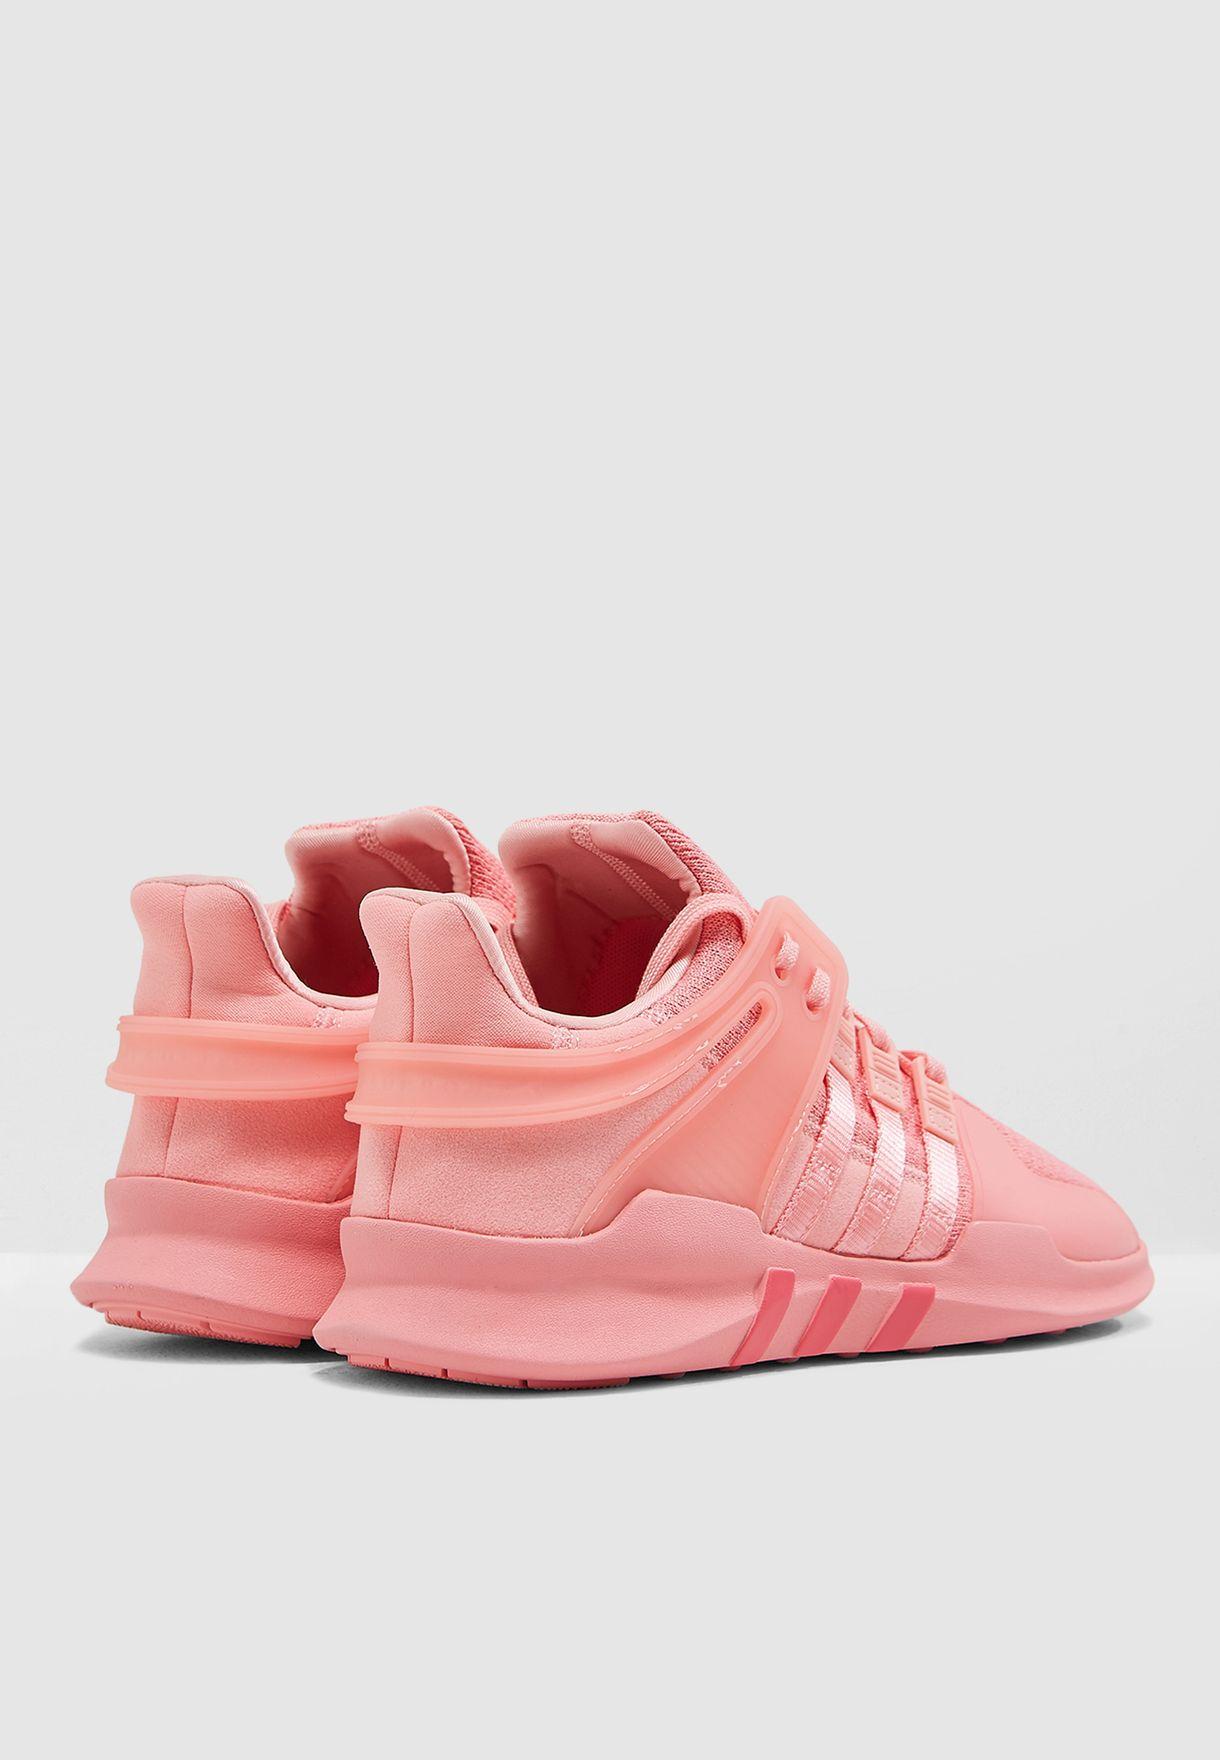 5e4f7a9aeebbf3 Shop adidas Originals pink EQT Support ADV B37541 for Women in ...